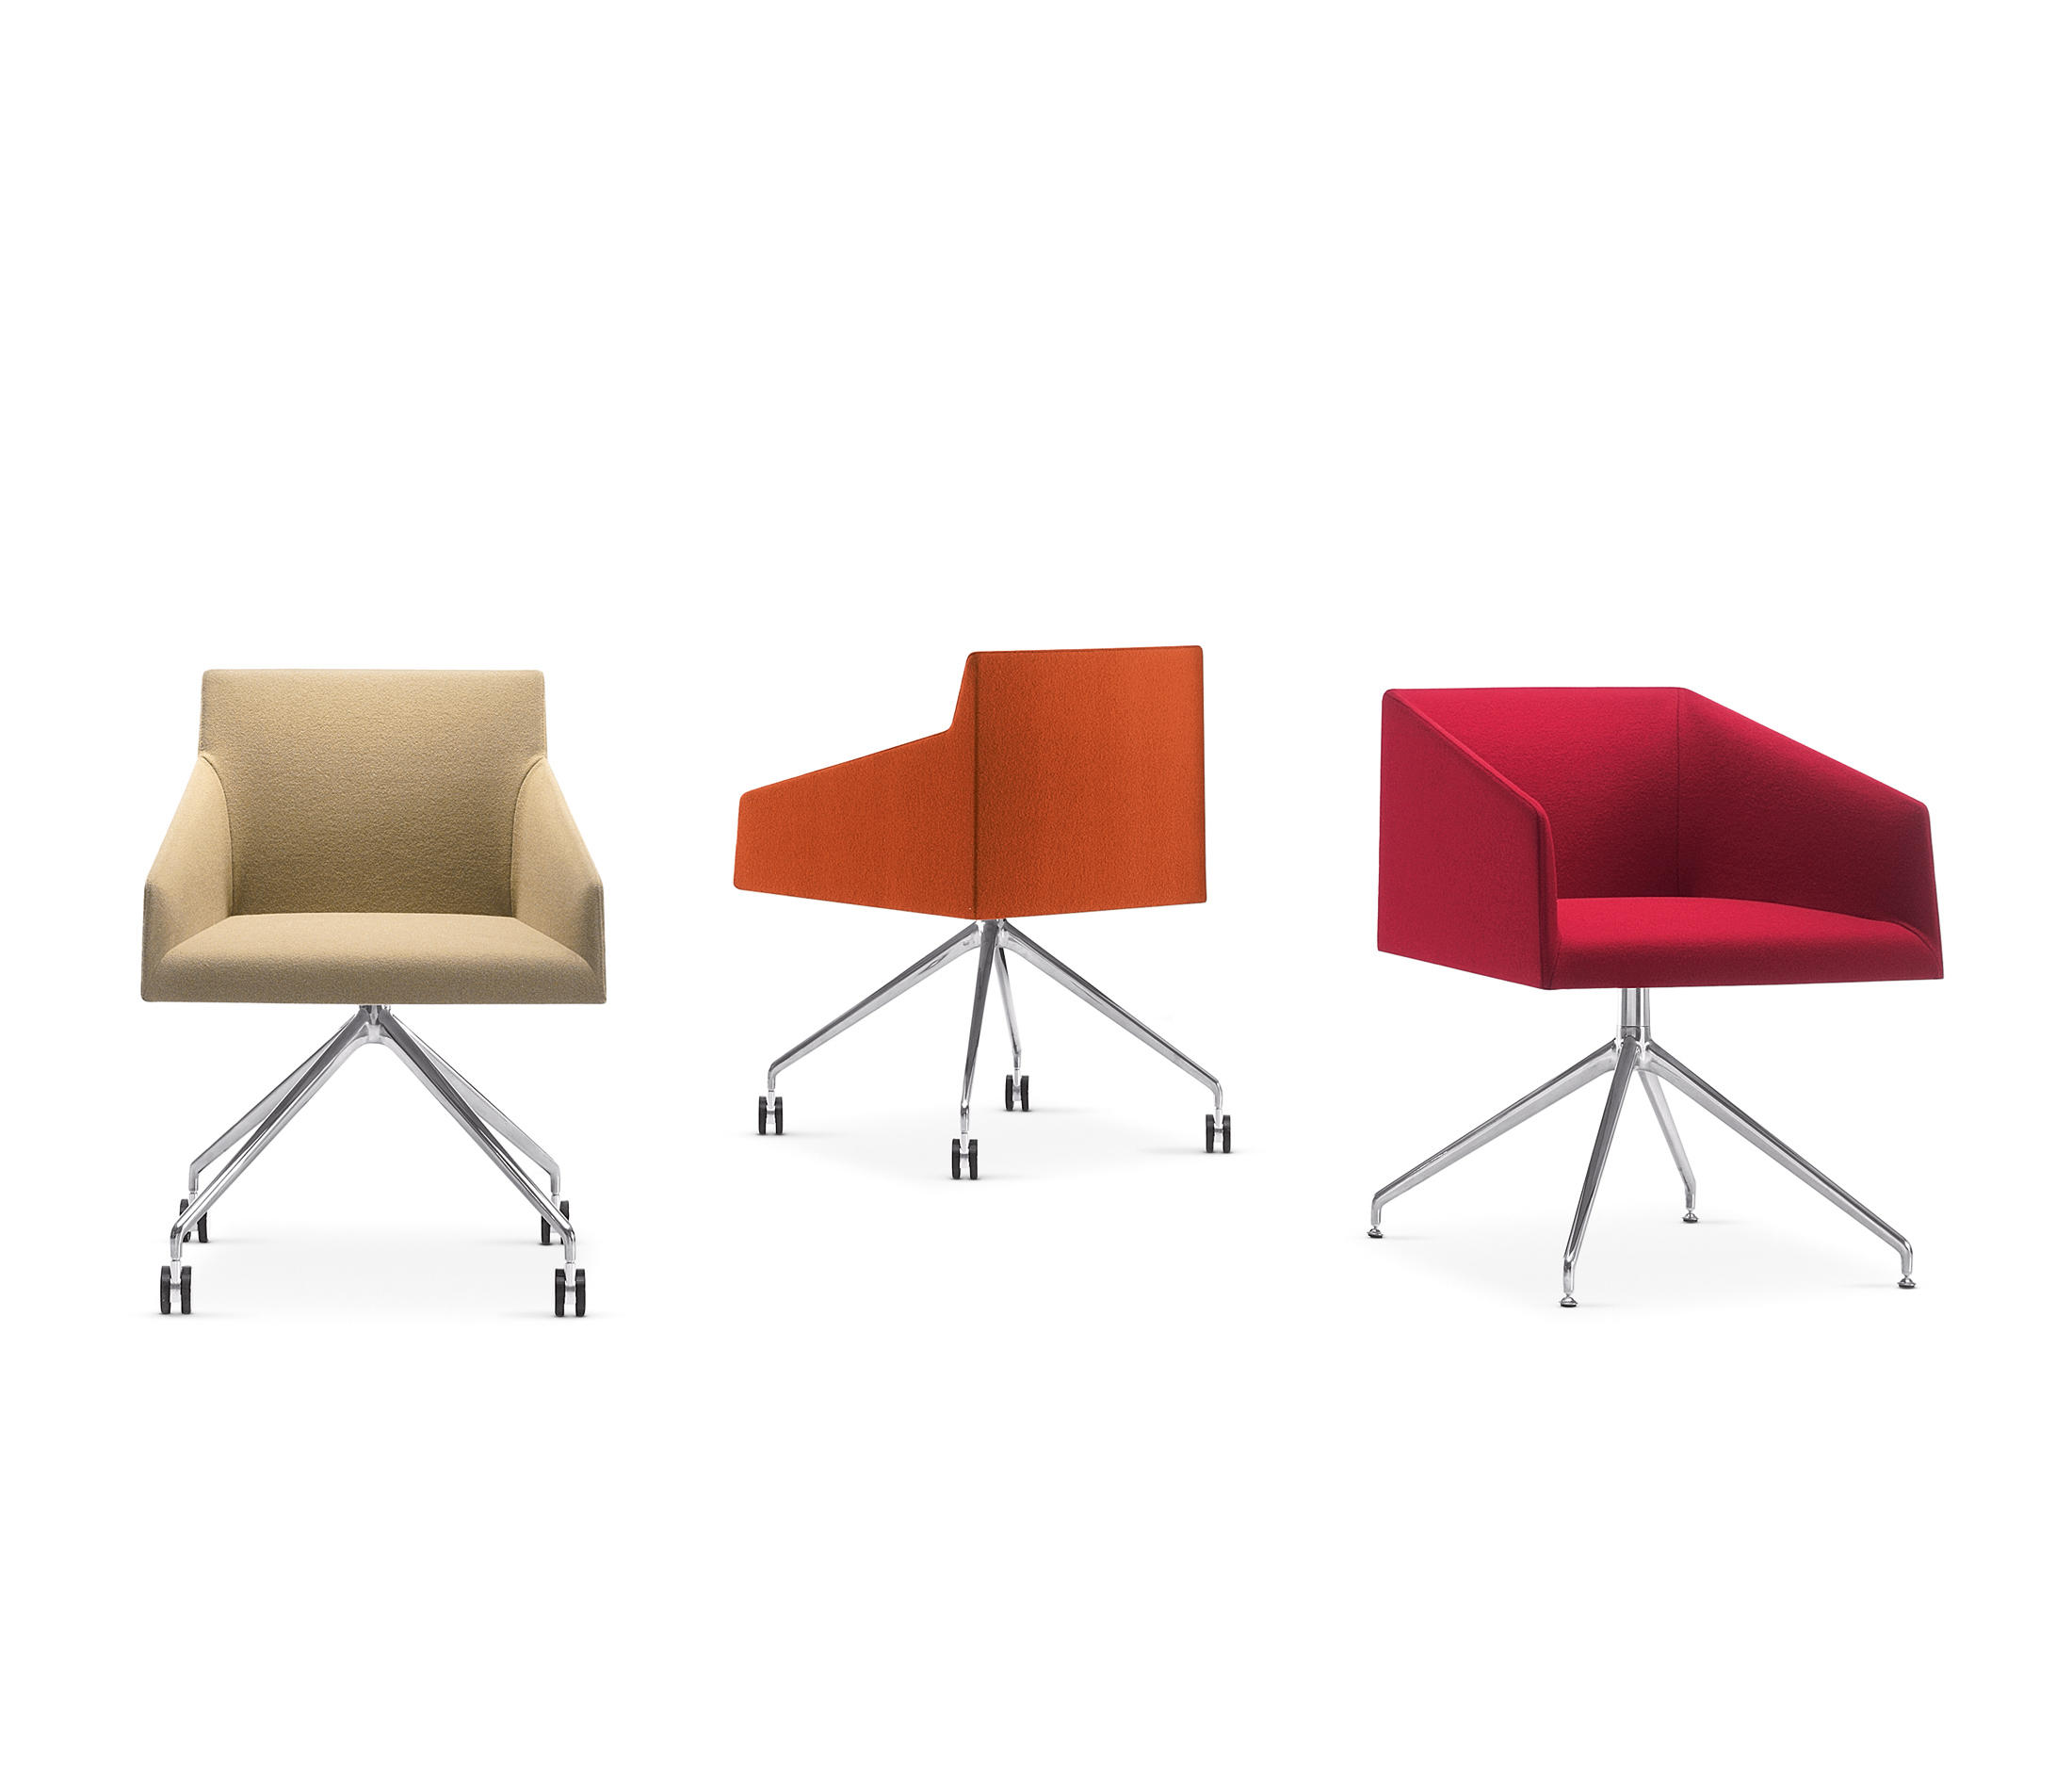 SAARI XL Lounge chairs from Arper